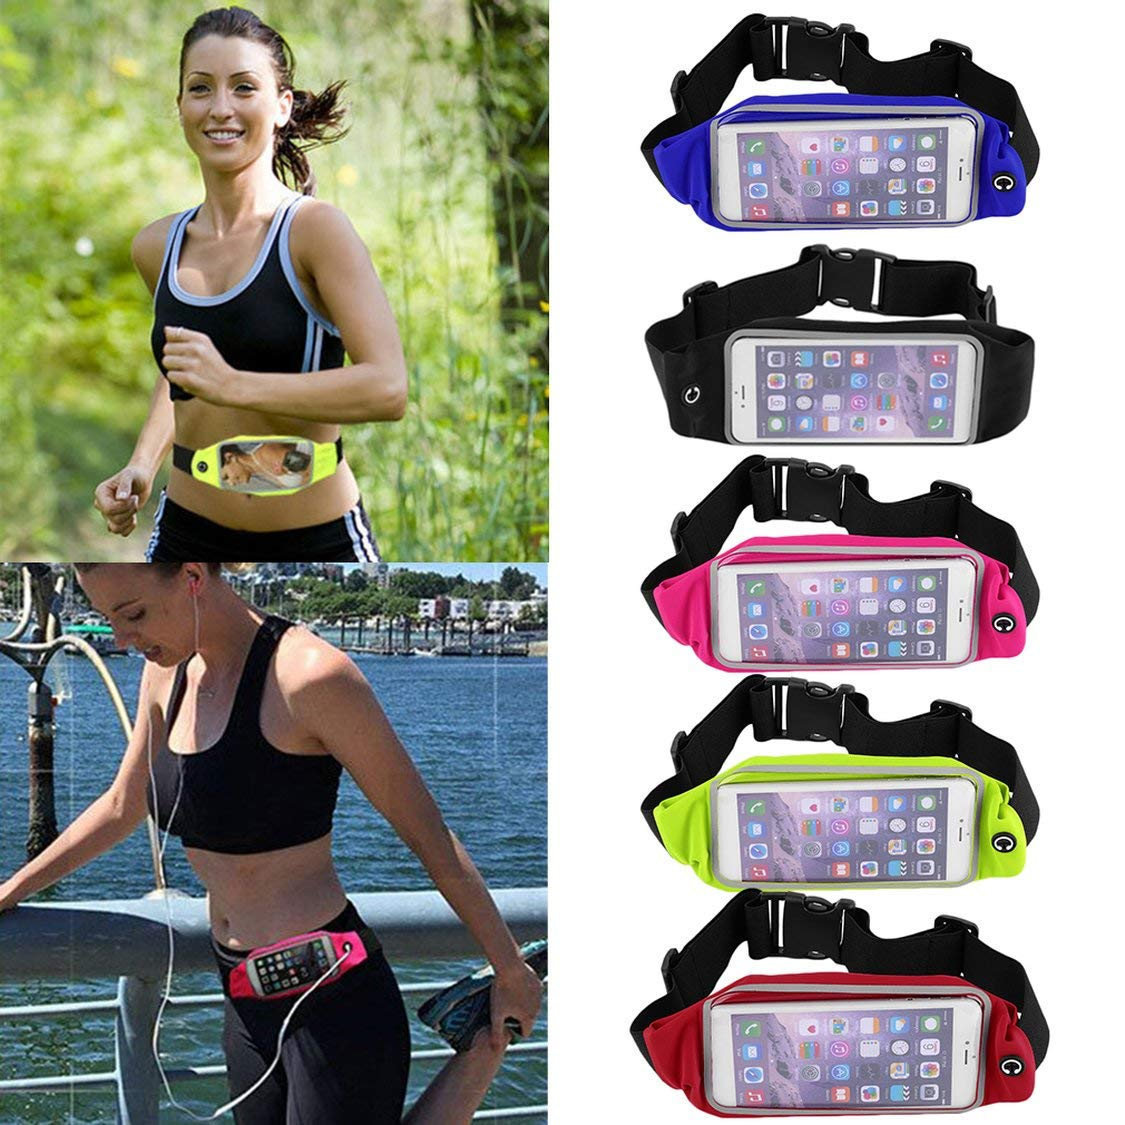 Waterproof Waist Travel Sport Running Belt Money Wallet Pouch For iPhone 6 Plus 5.5 Sports Pack Hiking Leisure Mini Zip Bag